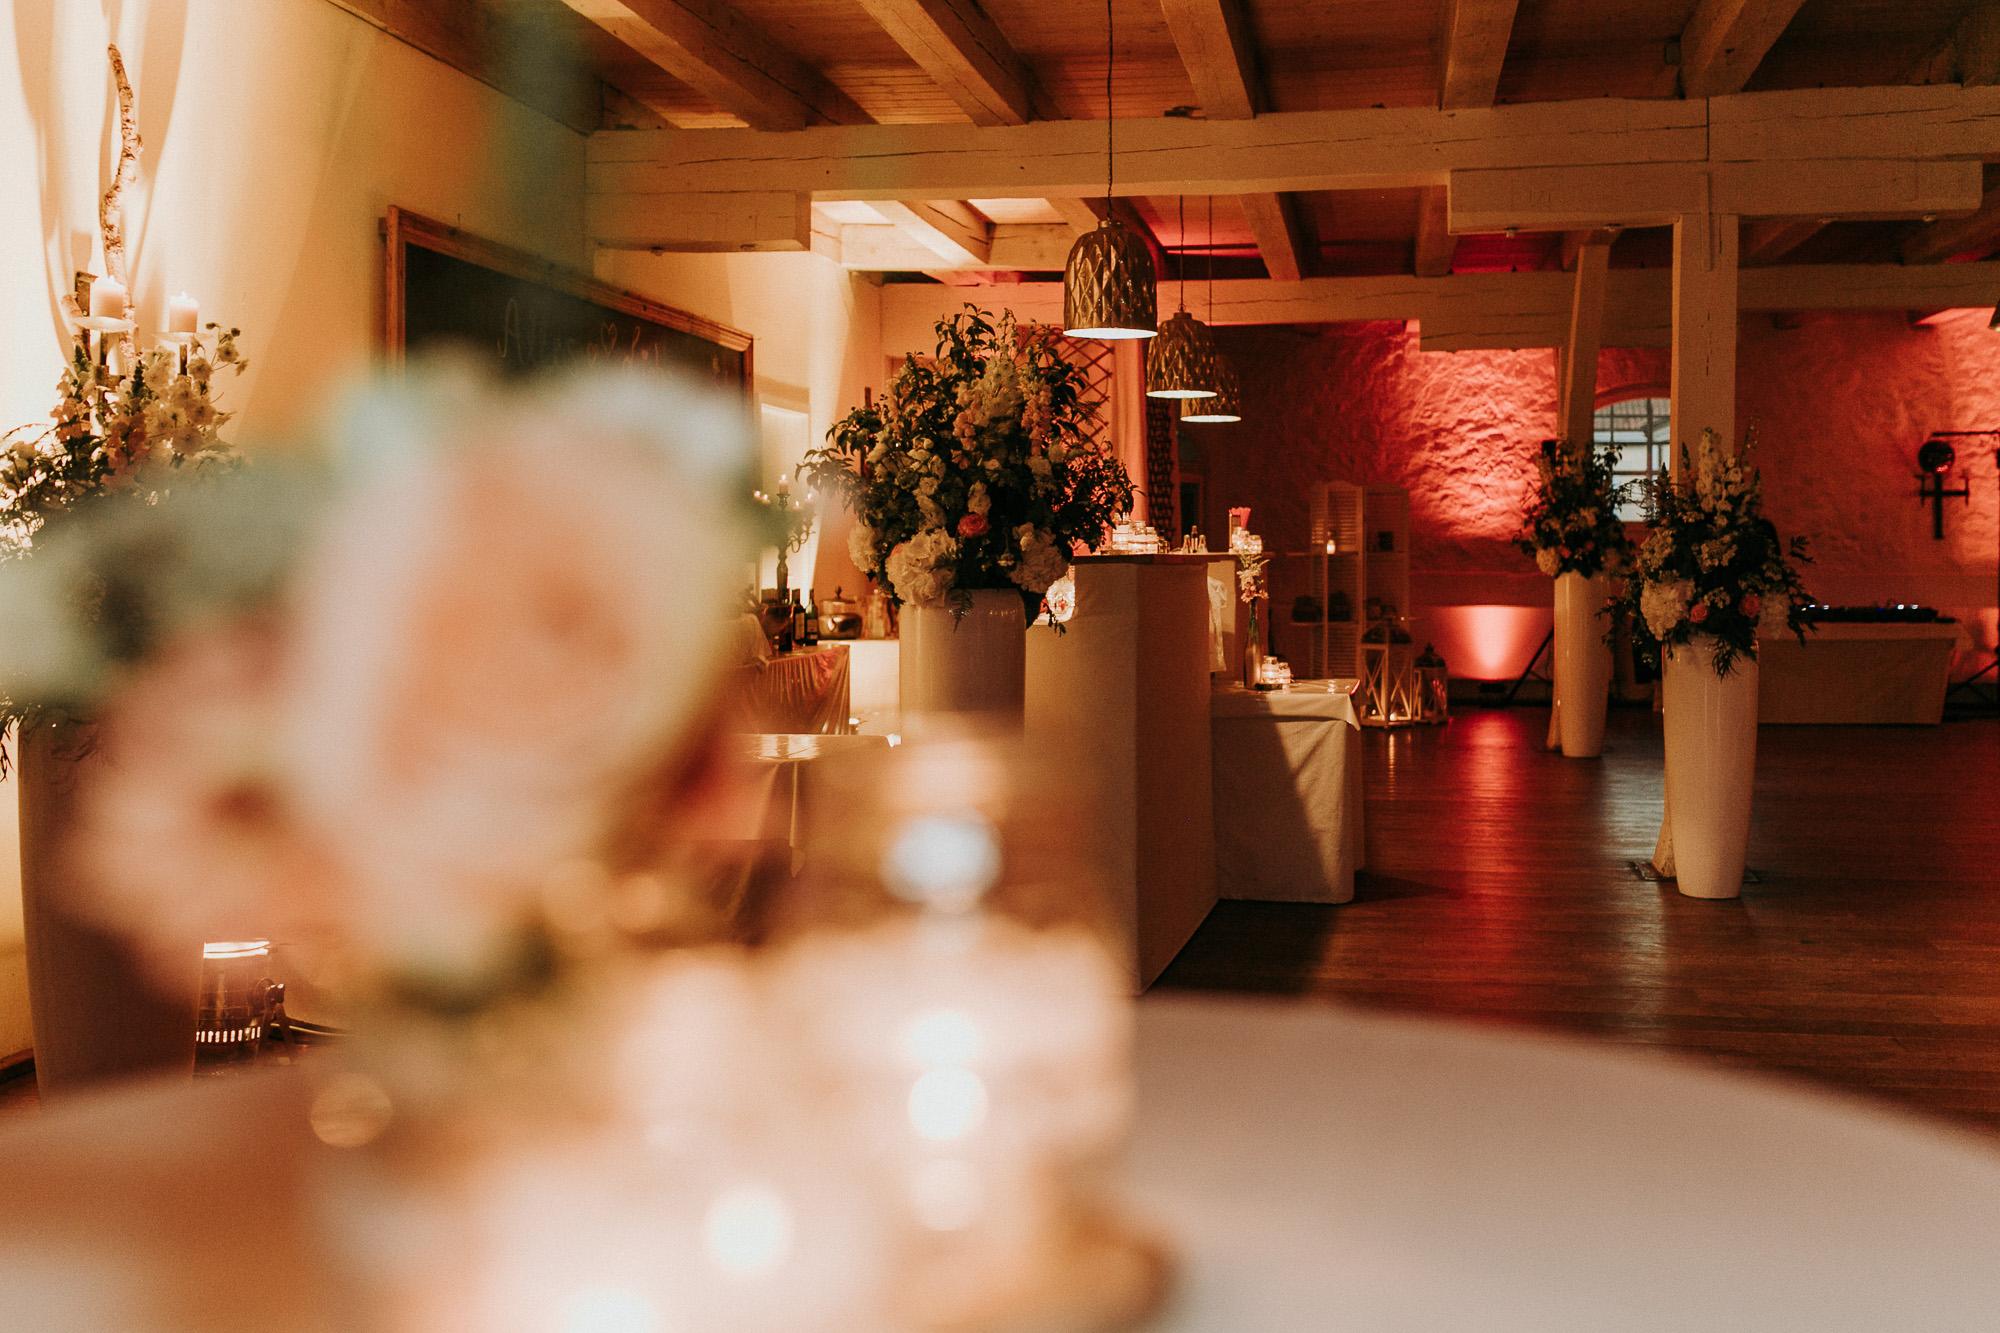 DanielaMarquardtPhotography_Hochzeitsfotograf_Düsseldorf_Köln_Mallorca_Bayern_Austria_Harz_Wedding_AileenundLennart_Weddingphotographer_Ibiza_Tuskany_Italien_Toskana_Portugal_Lissabon253